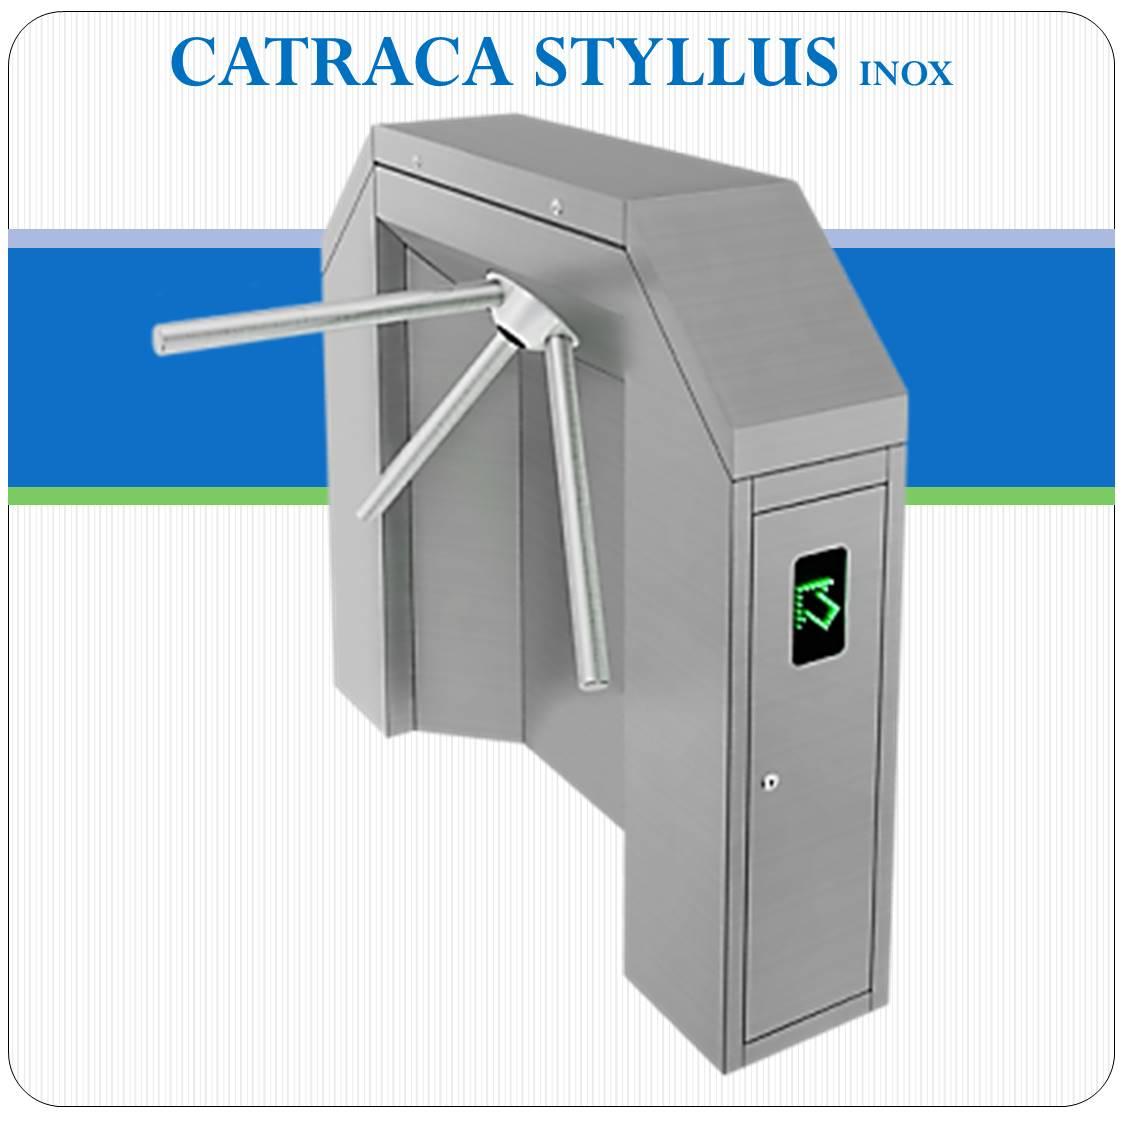 Catraca Balcão Styllus